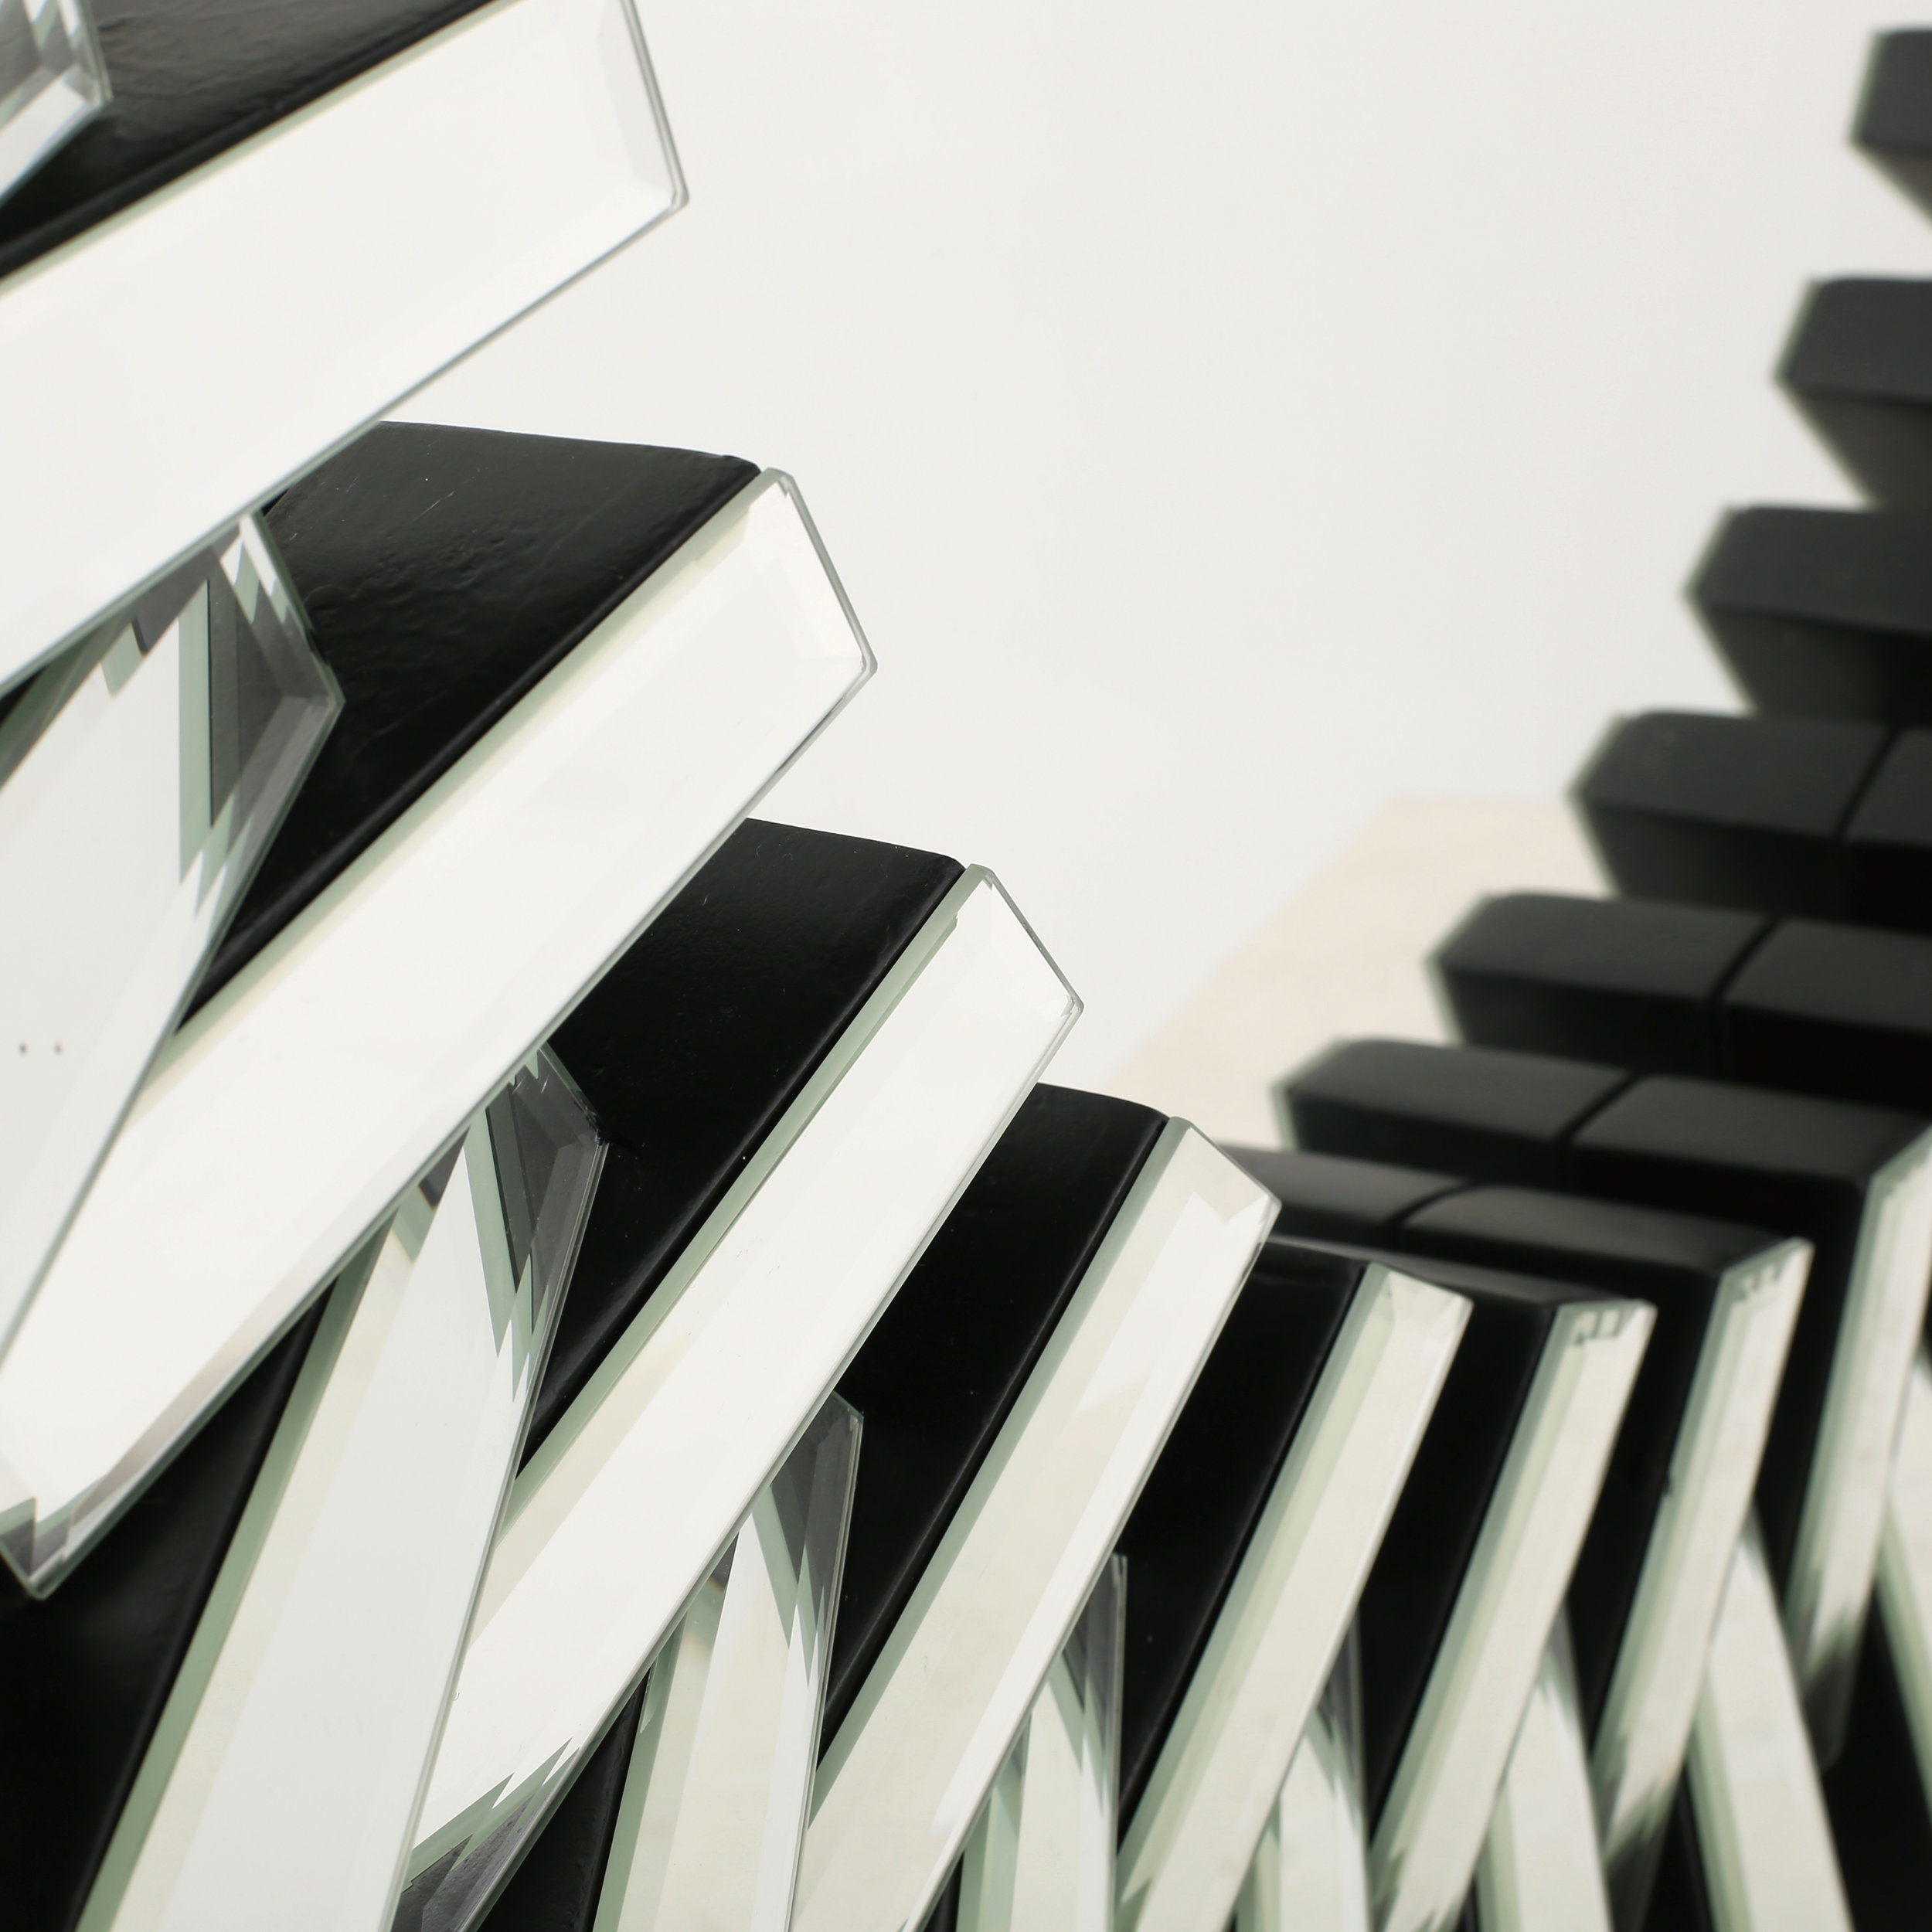 Willa Arlo Interiors Deniece Sunburst Round Wall Mirror In Deniece Sunburst Round Wall Mirrors (Image 17 of 20)